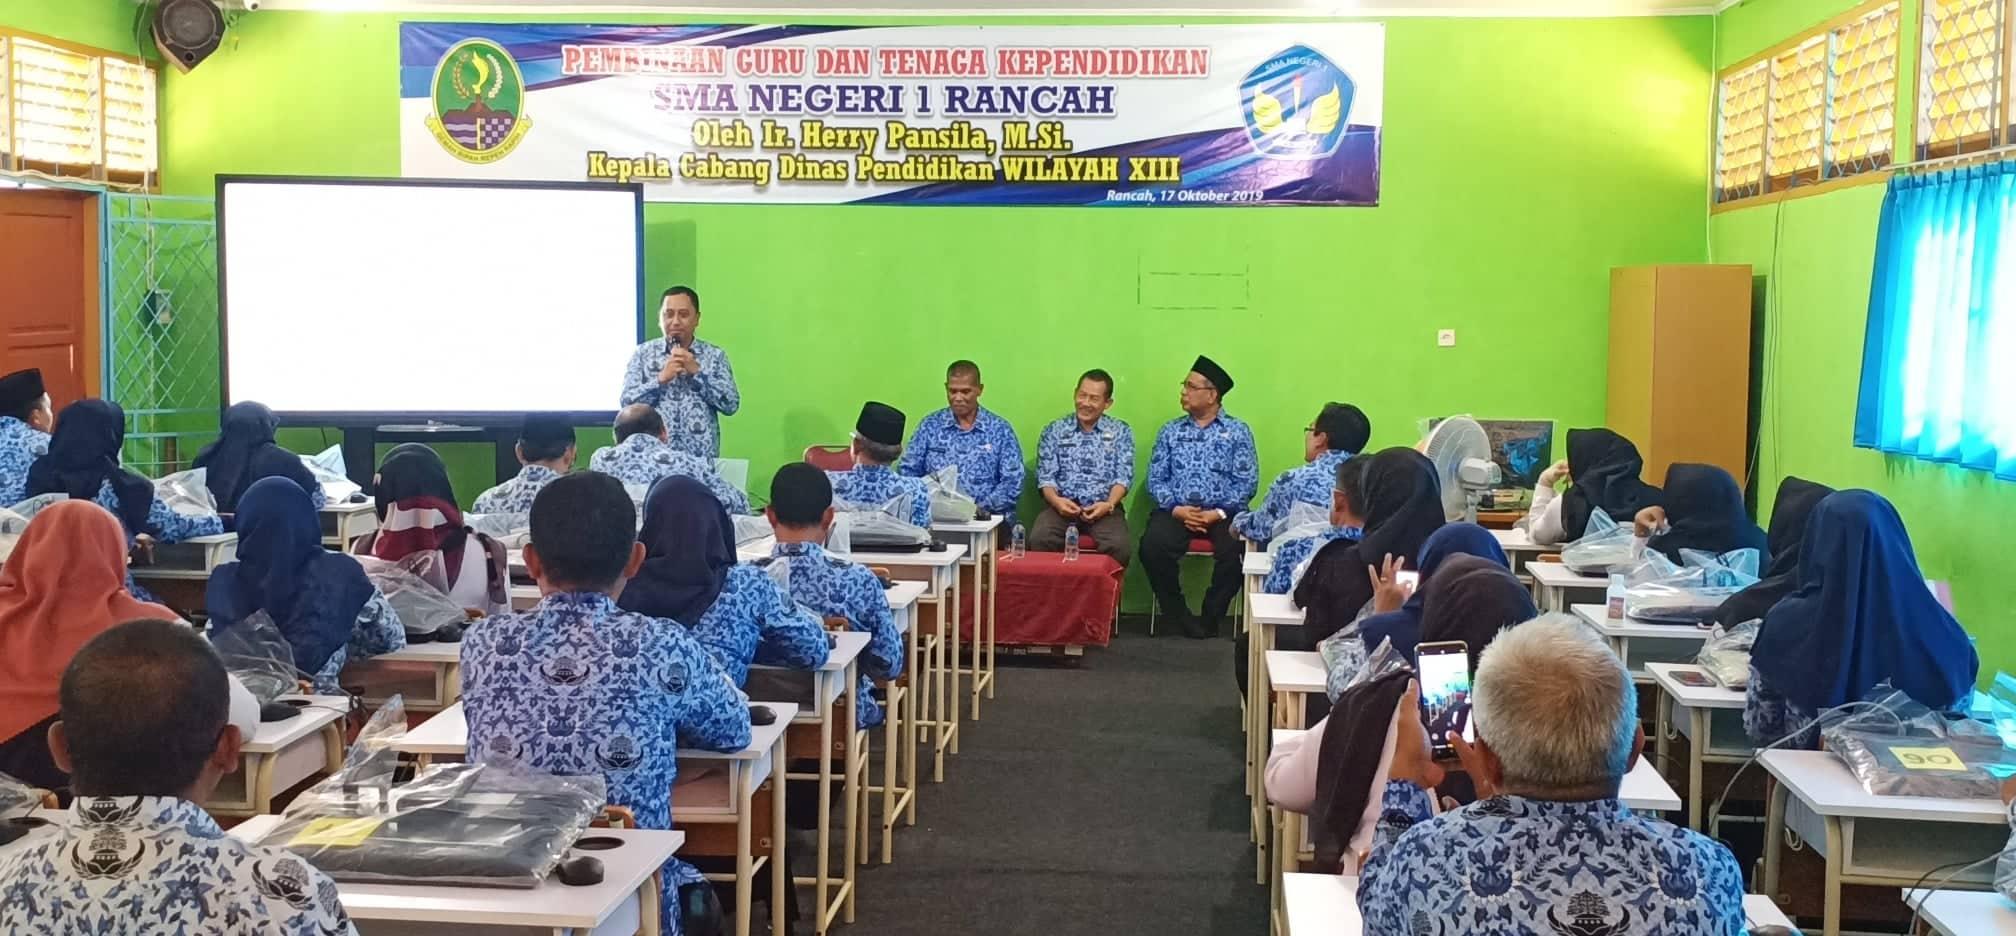 Kepala Cabang Dinas wilayah XIII, Herry Pansila memberikan pembinaan kepada 70 PTK di SMAN 1 Rancah-swarapendidikan.co.id